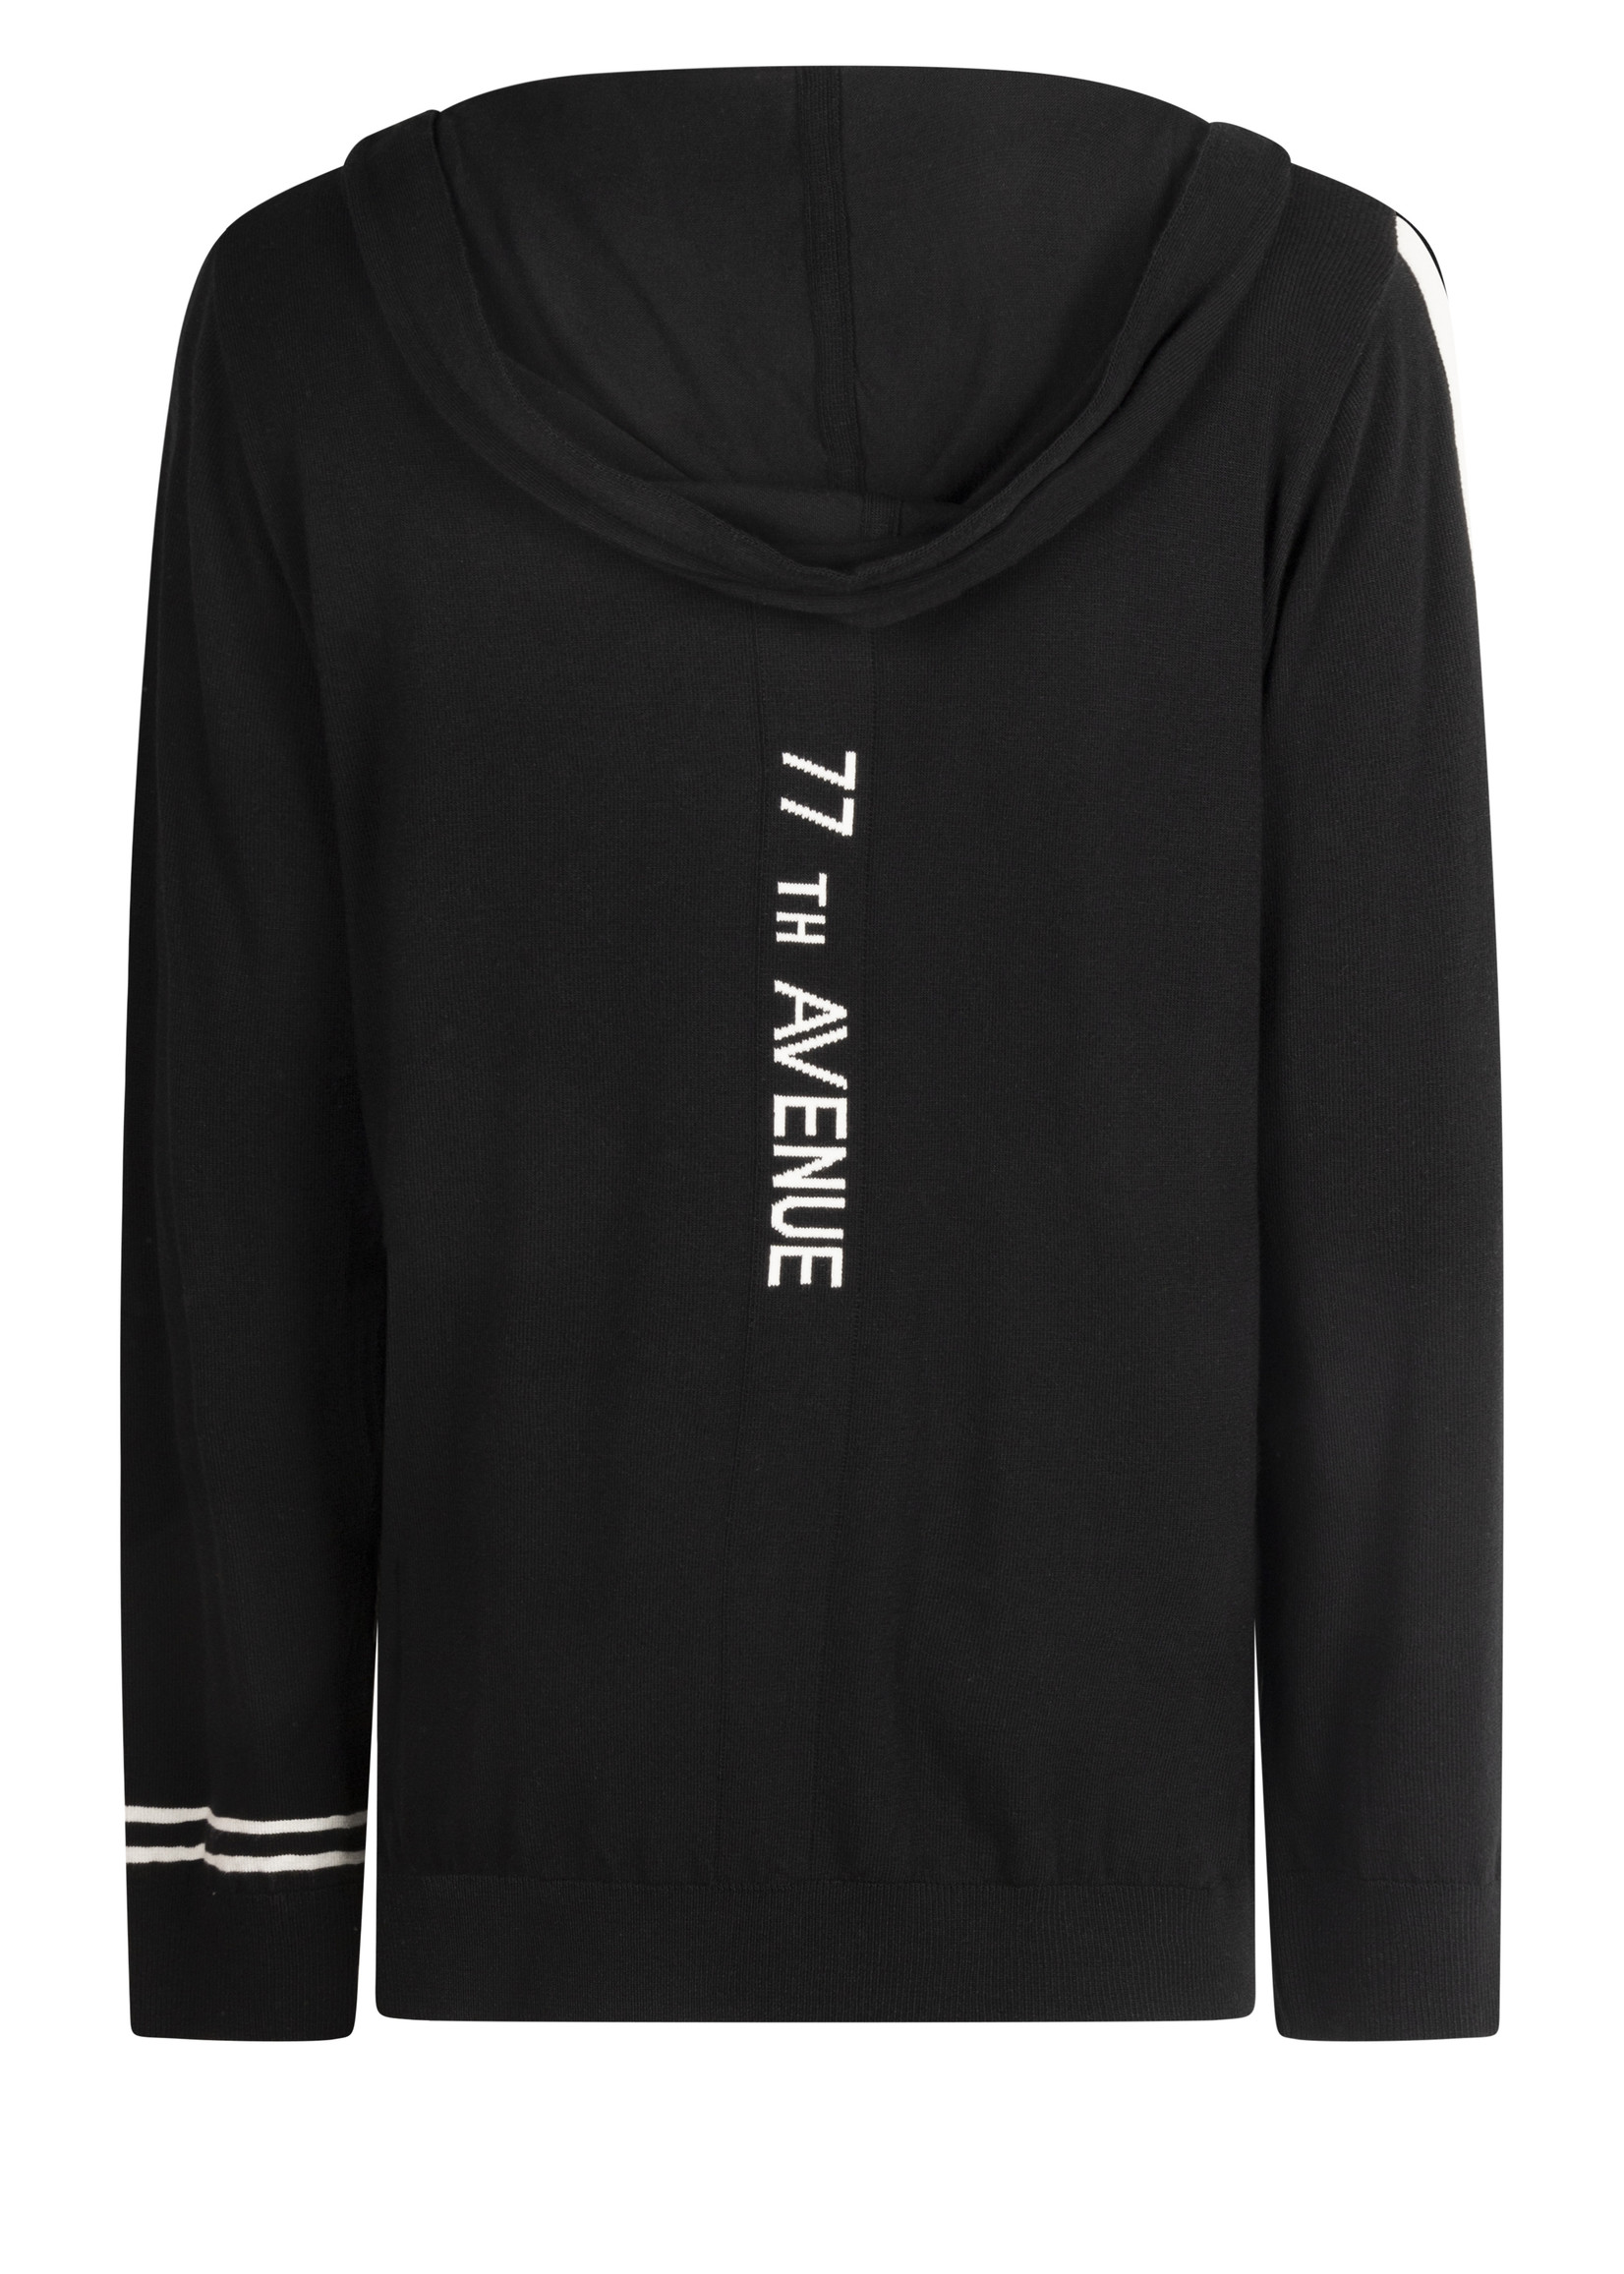 Zoso Zoso - Feline - Luxury knitted hoody